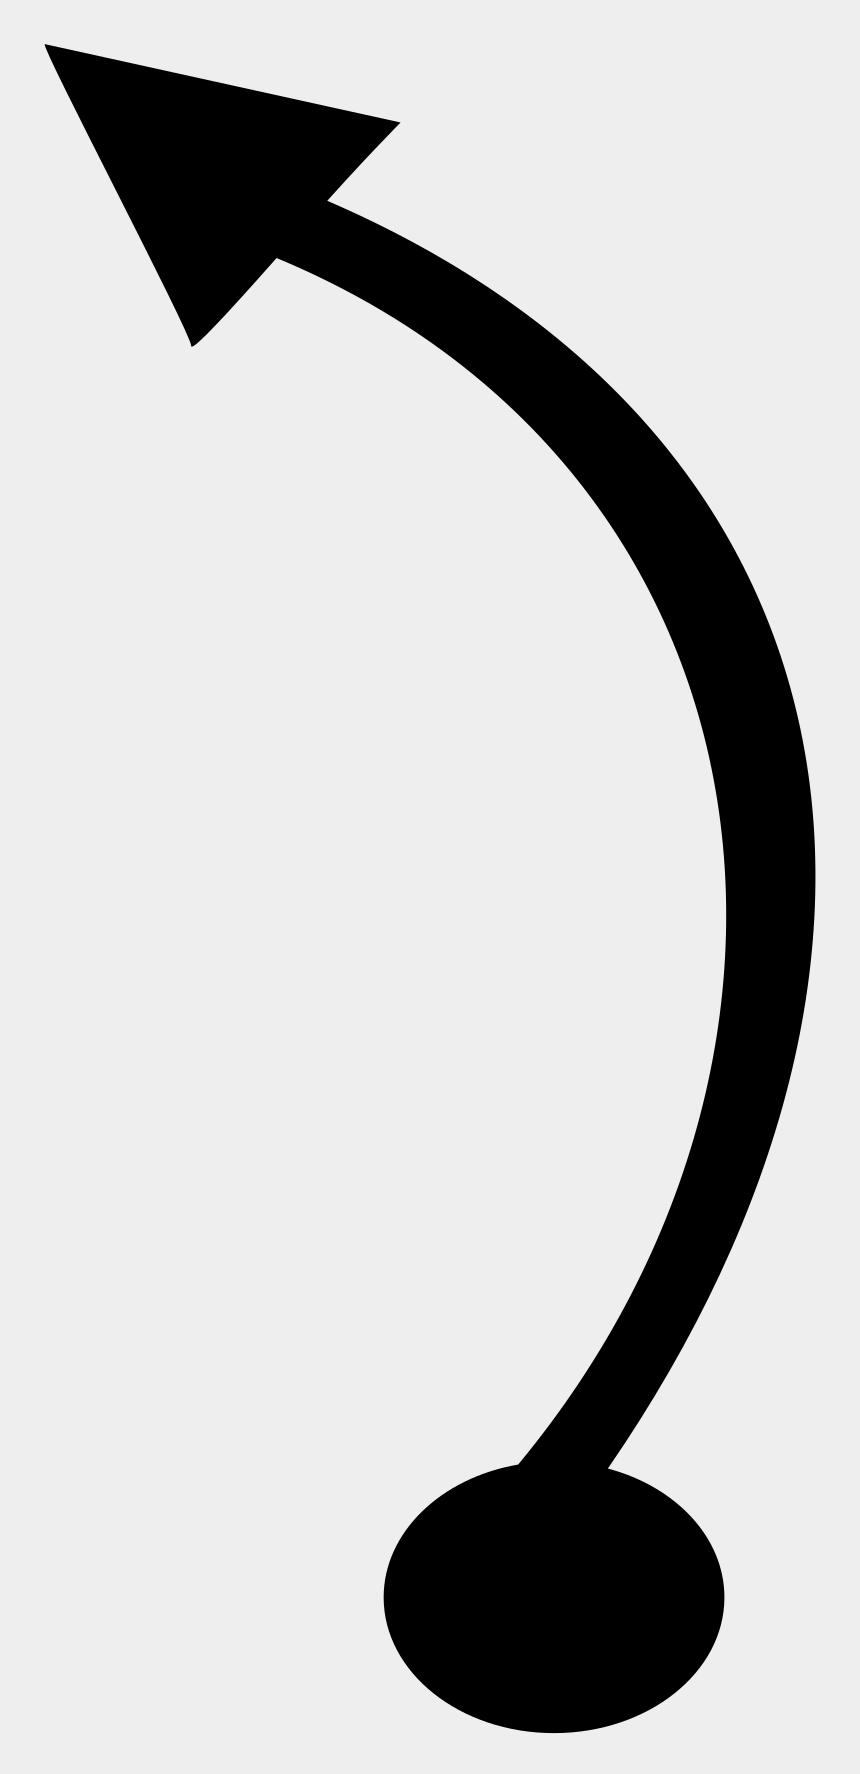 arrow clip art, Cartoons - Curved Arrow Circular Arrow Clip Art - Curved Arrow Lines Png